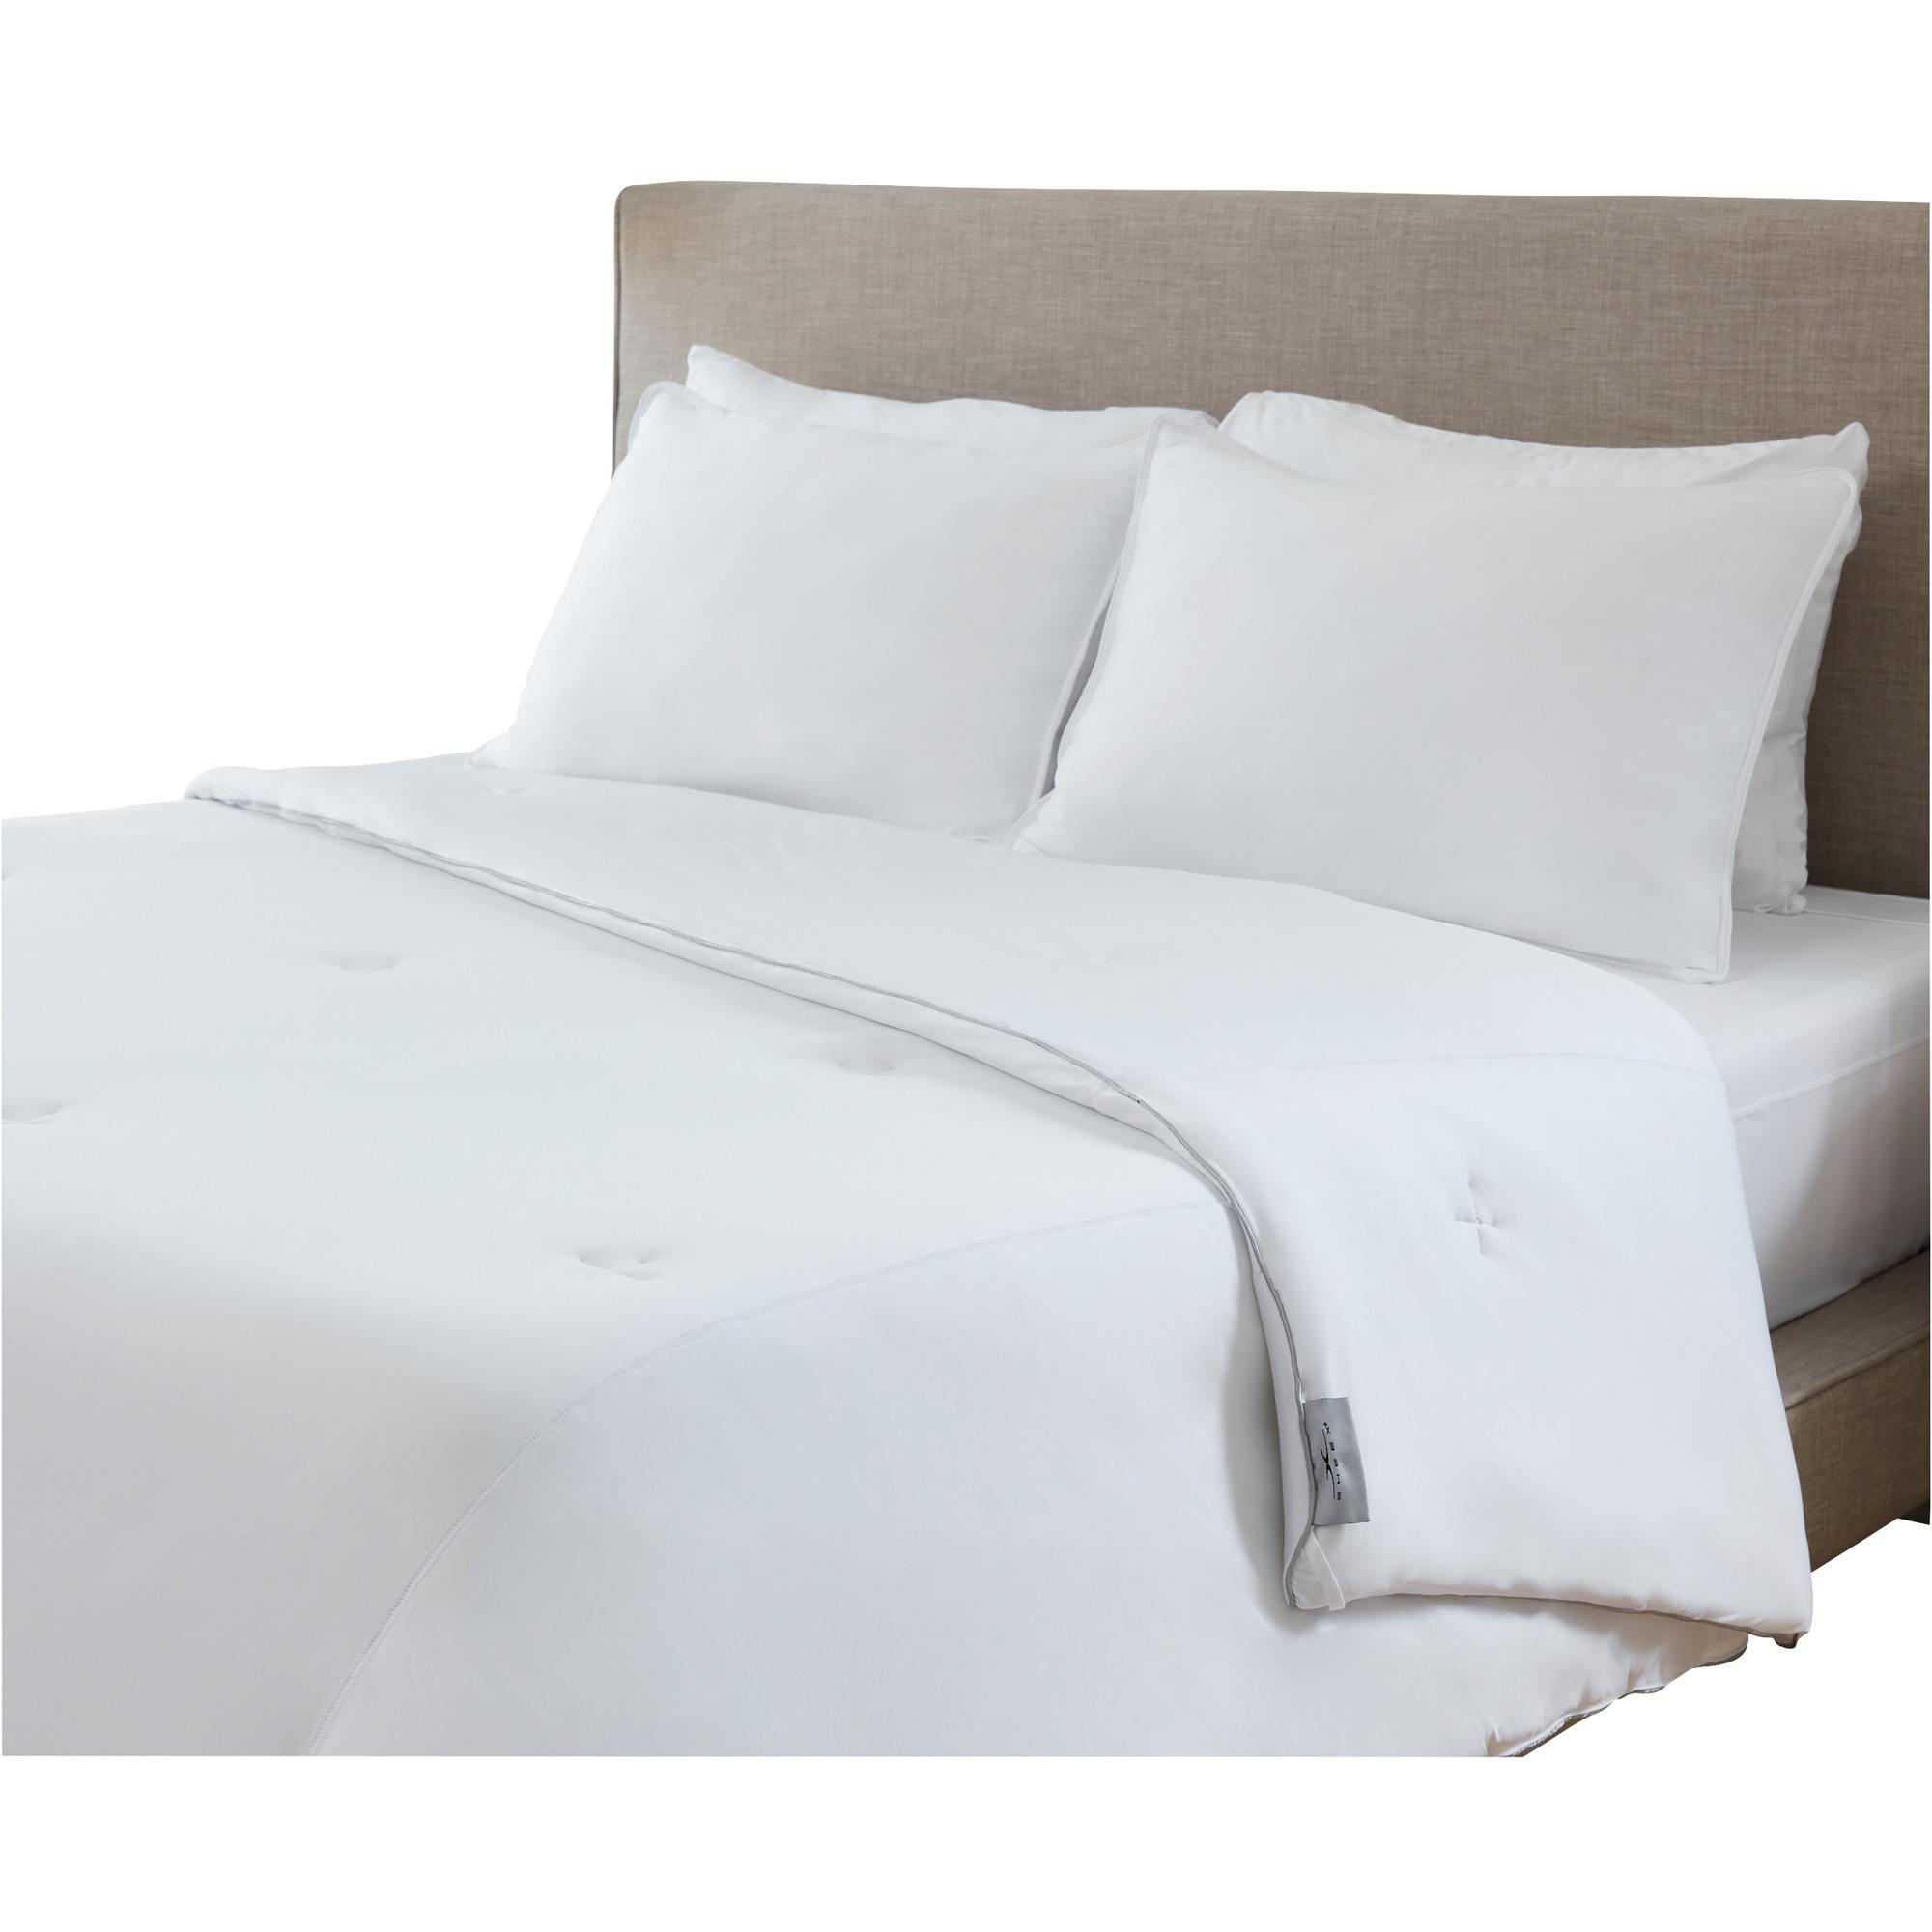 Sheex Inc. | SHEEX AeroFit Bright White King Performance Down Alternative Comforter